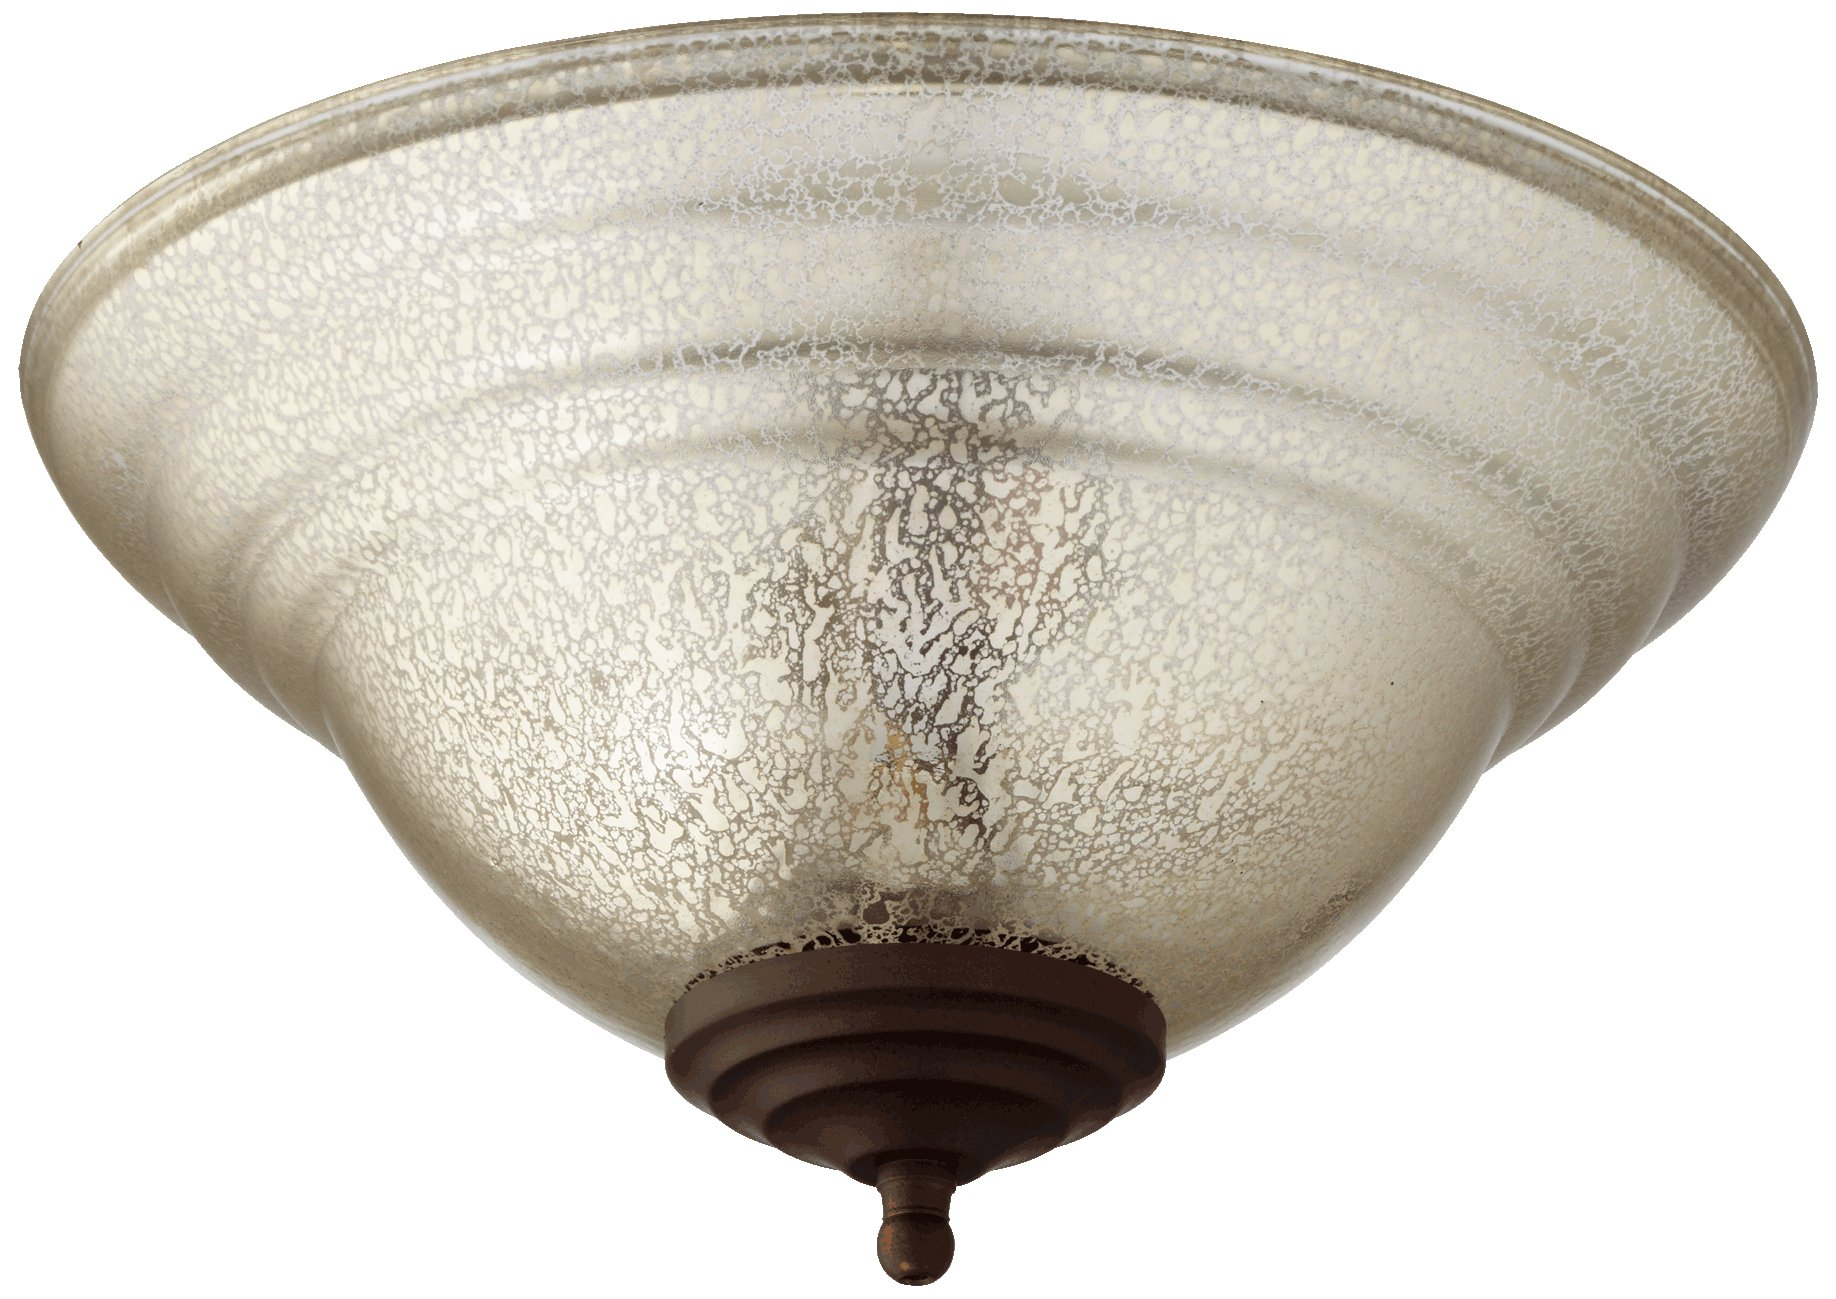 Quorum International 1147-801 Silver Mercury Light Kit, Satin Nickel/Oiled Bronze by Quorum International